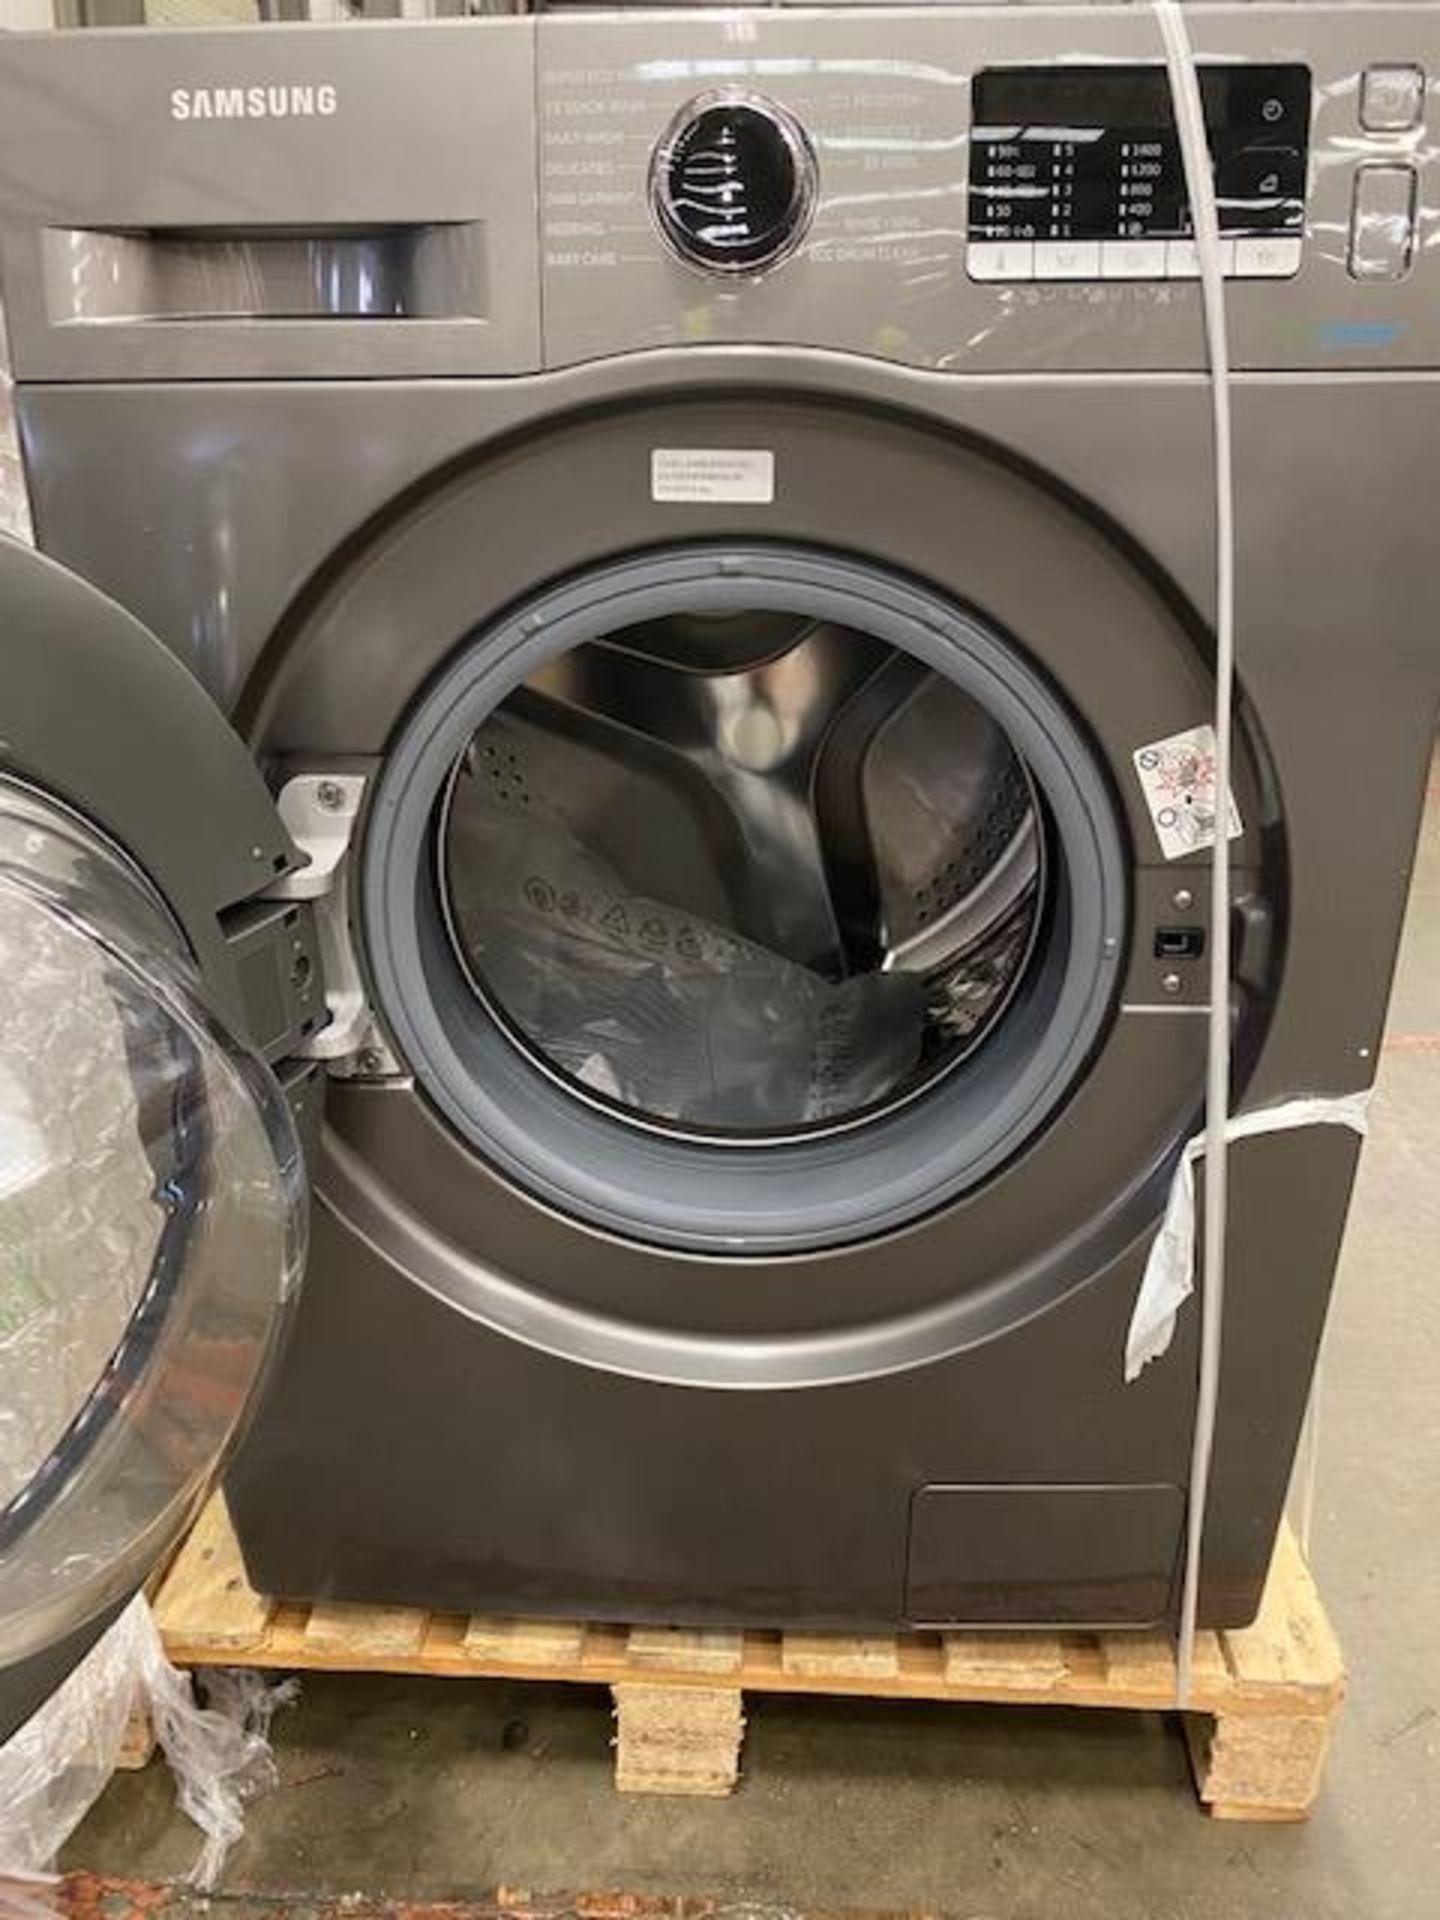 Pallet of 2 Samsung Premium Washing machines. Total Latest selling price £678* - Image 8 of 9